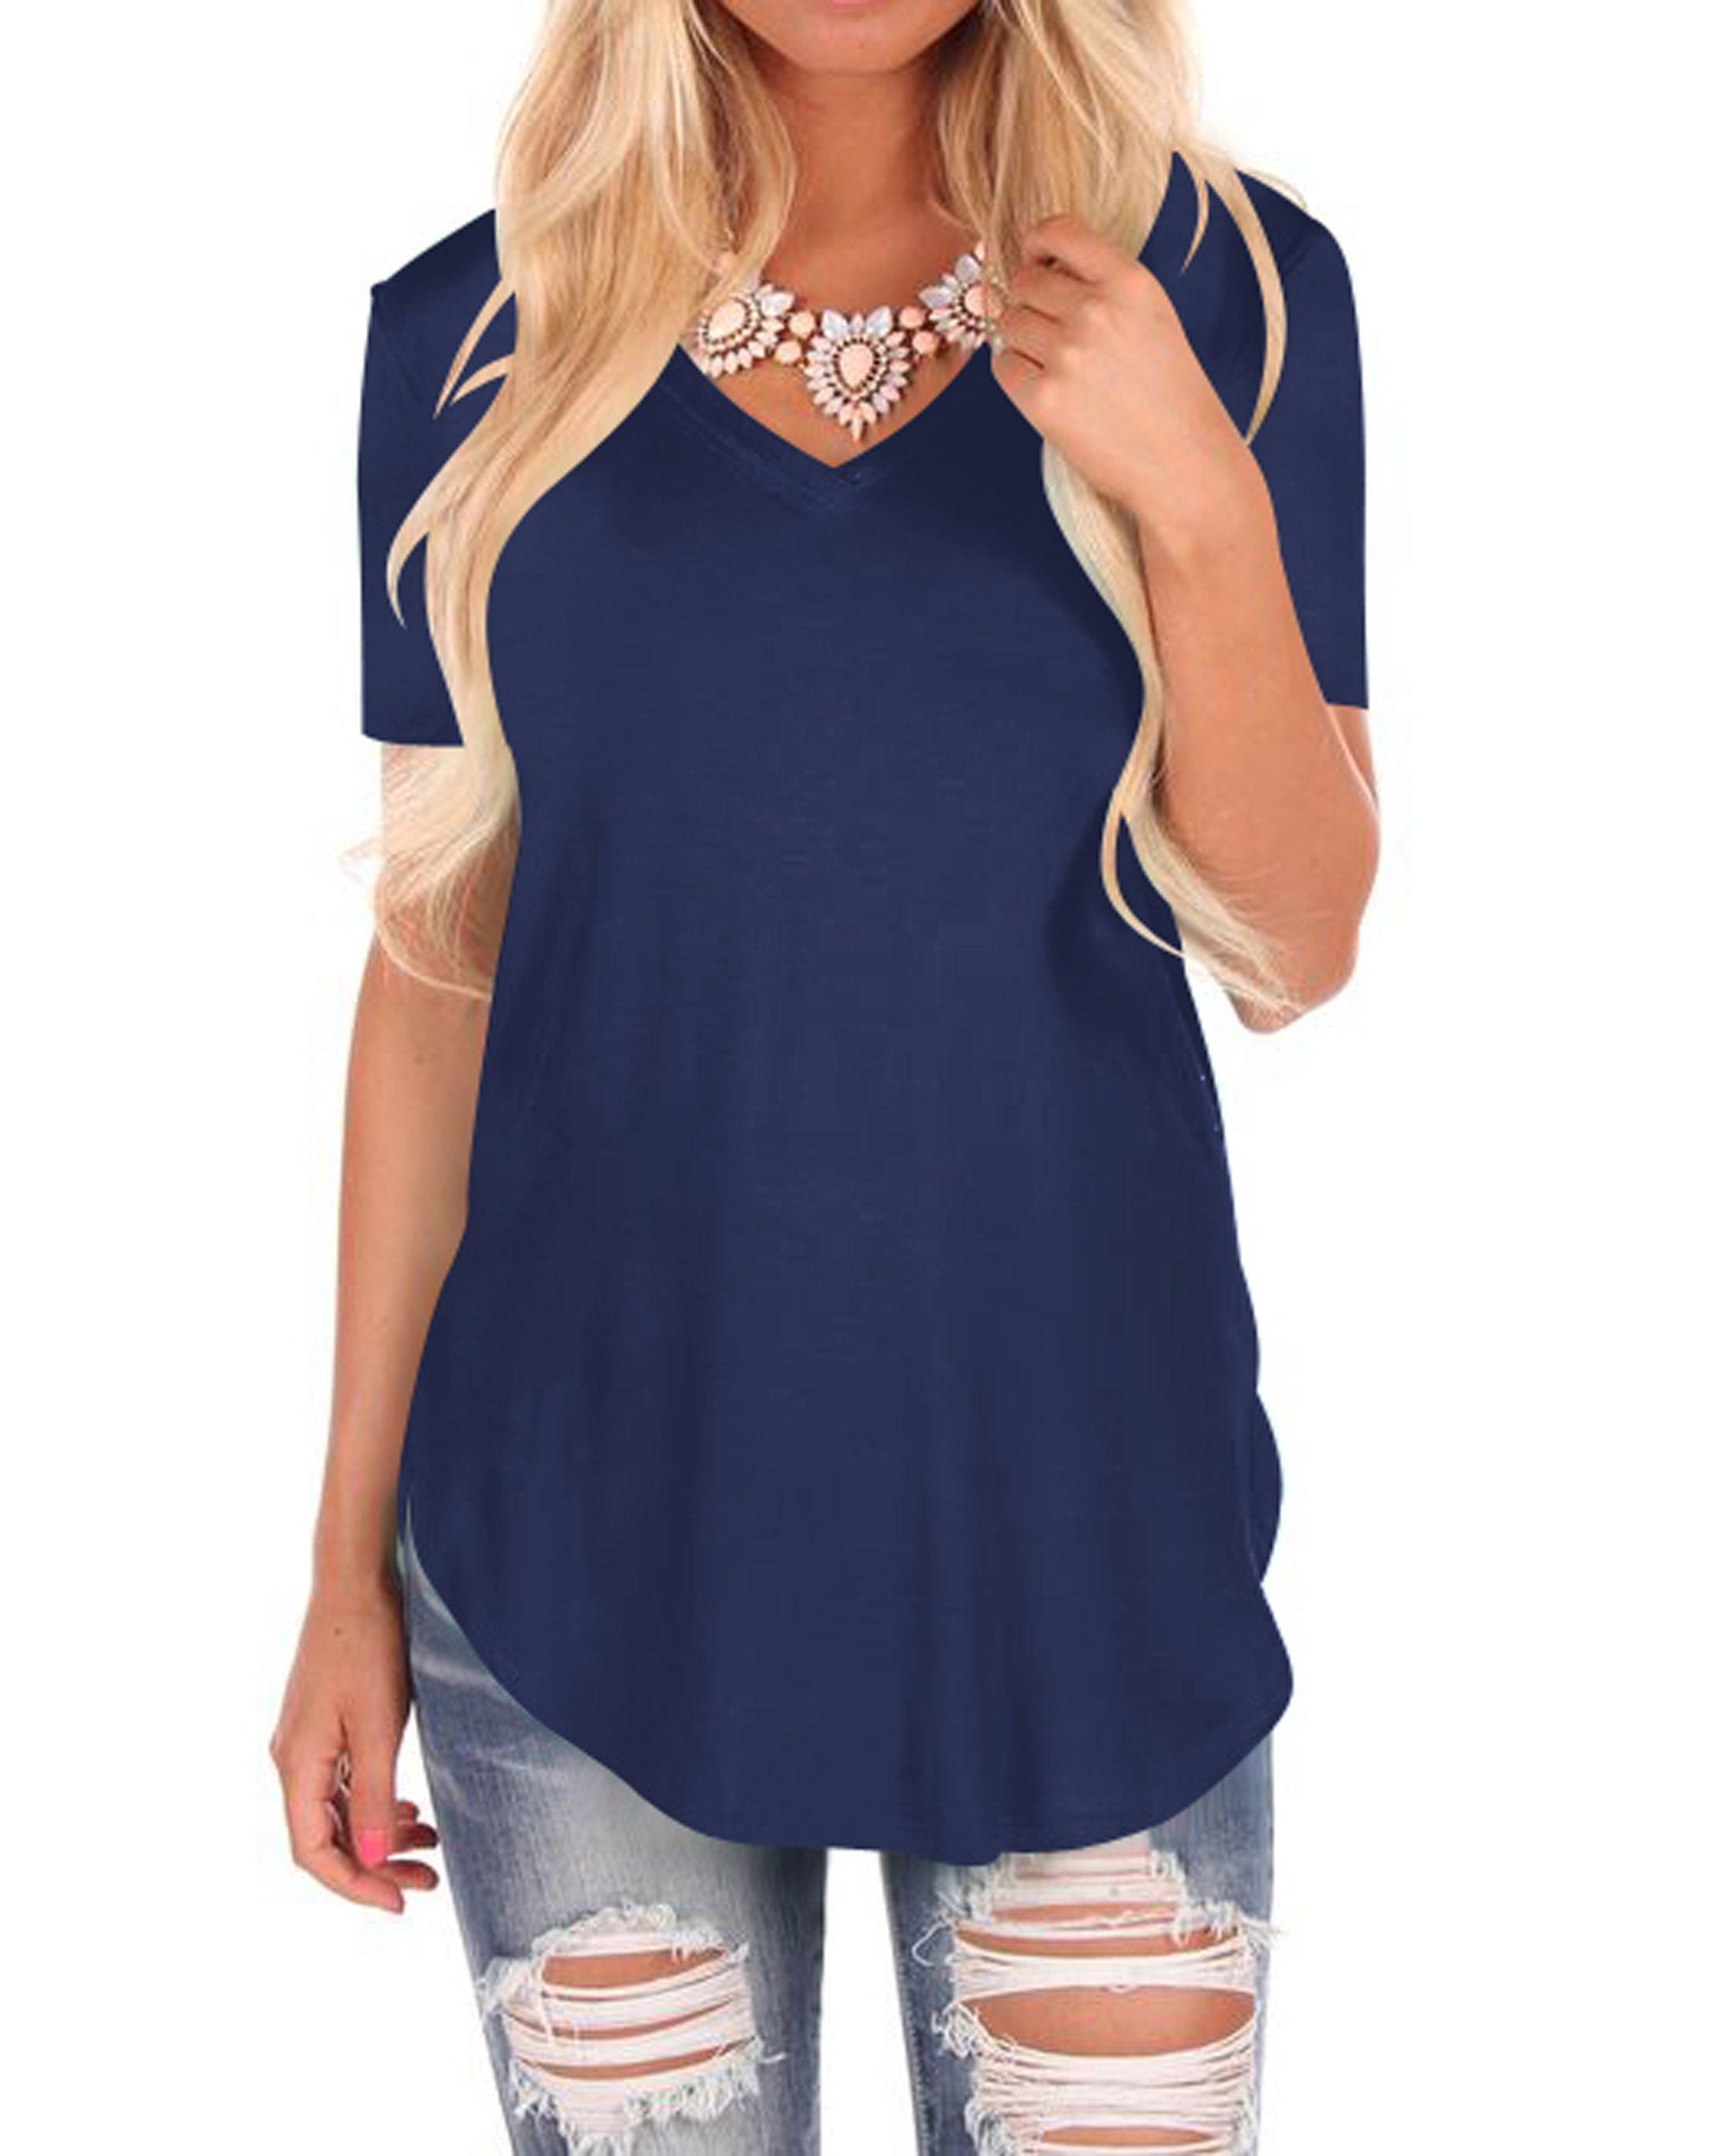 WFTBDREAM Womens Loose Fashion Solid Short V Neck Tops Curved Hem Navyblue XL